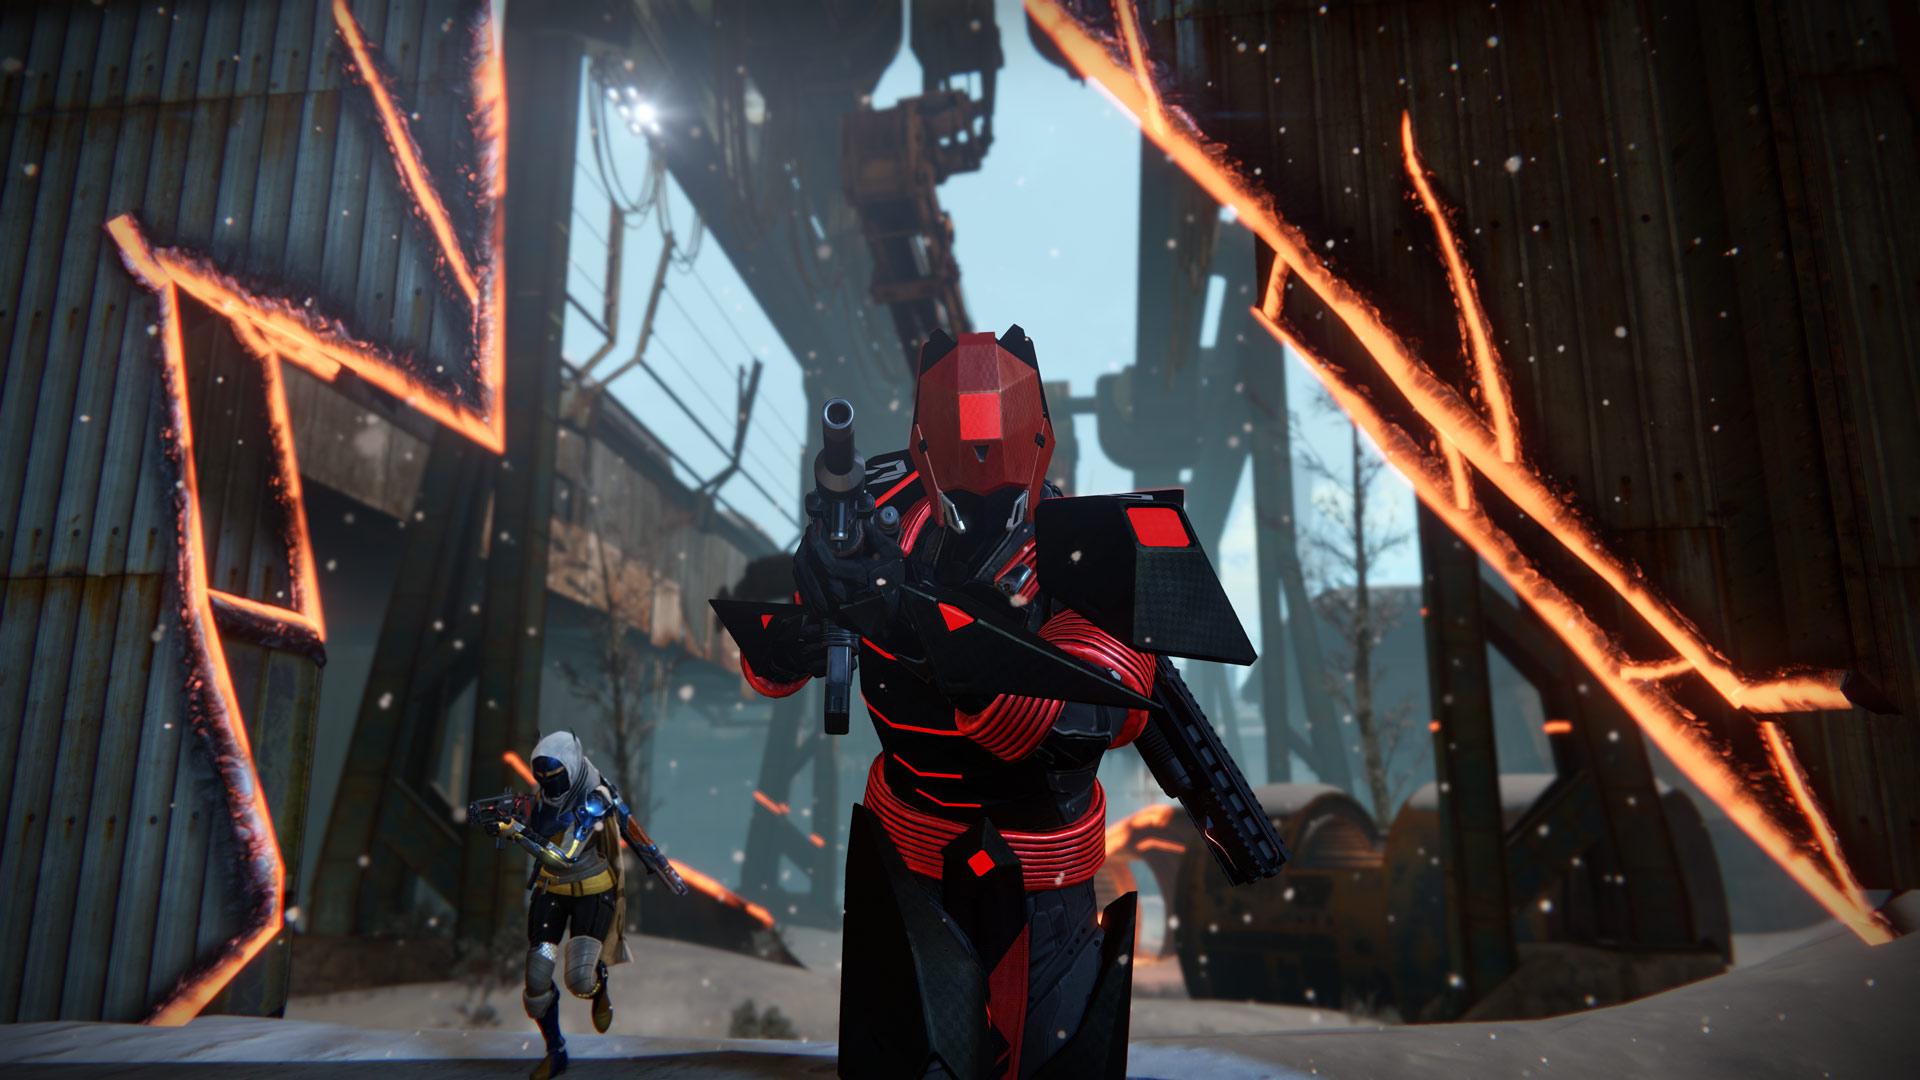 Destiny quarantine patrol clipart graphic black and white library Destiny: Rise of Iron Review graphic black and white library